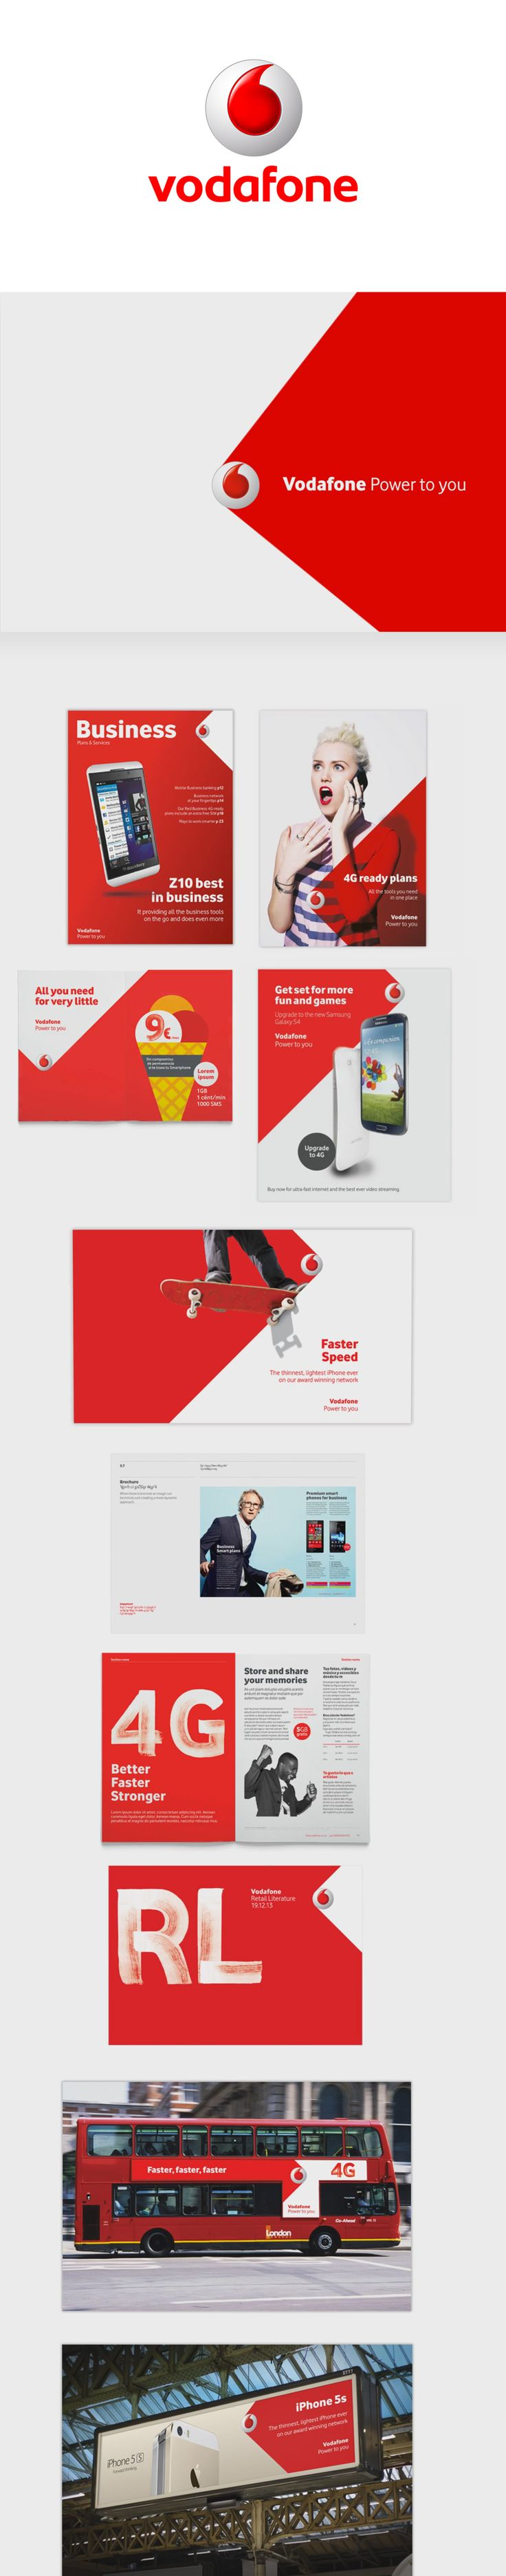 Pinned from https://pinterest.com/rothenhaeusler/best-of-corporate-design/ ·  Client: Vodafone · Agency: Jung von Matt/Alster #branding #identity #corporatedesign